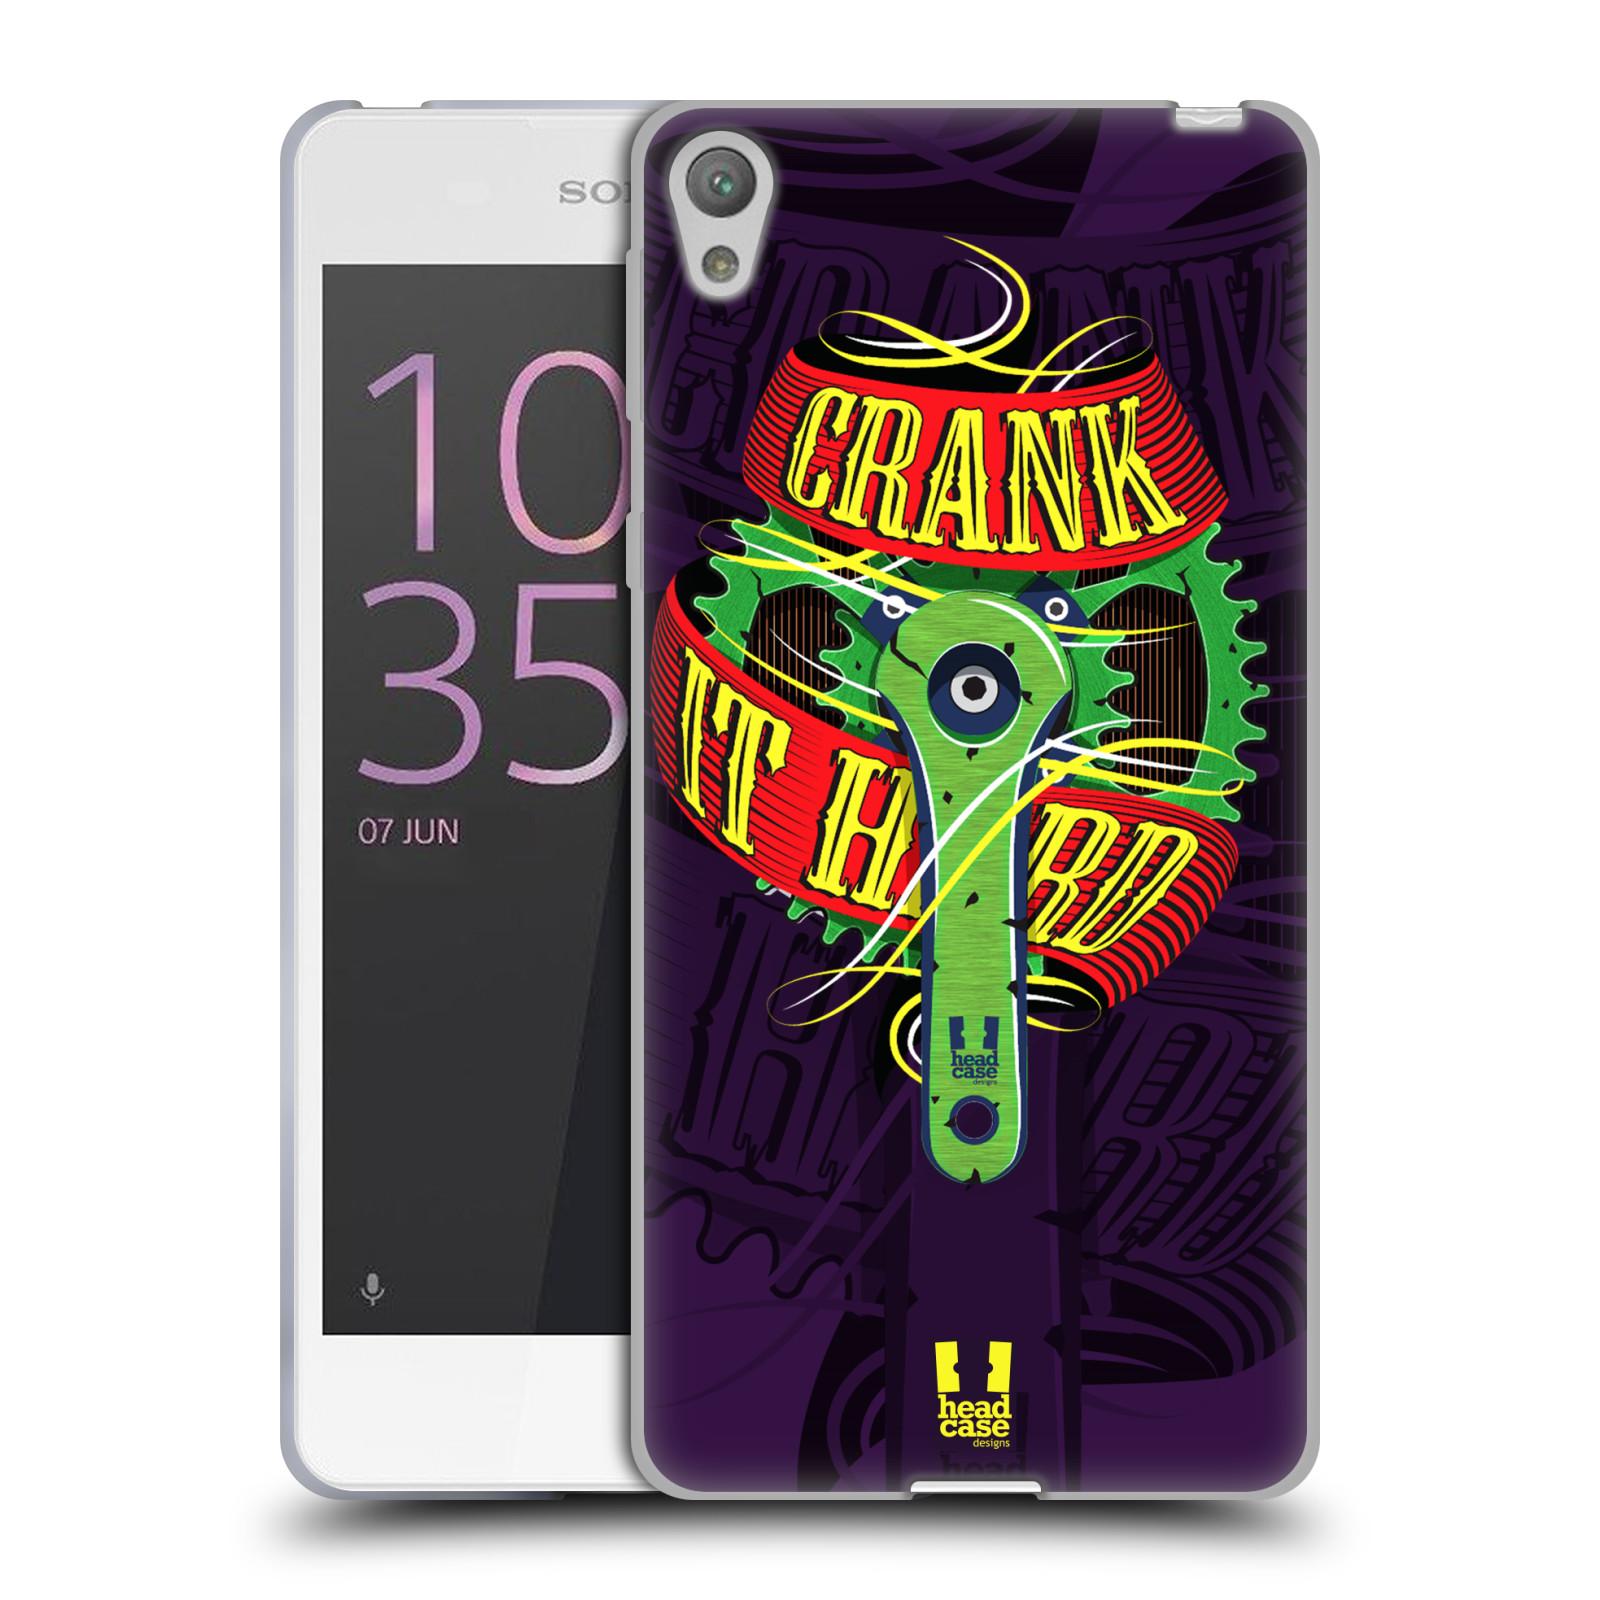 HEAD CASE silikonový obal na mobil Sony Xperia E5 Cyklista pedály šlápni do toho CRANK IT HARD